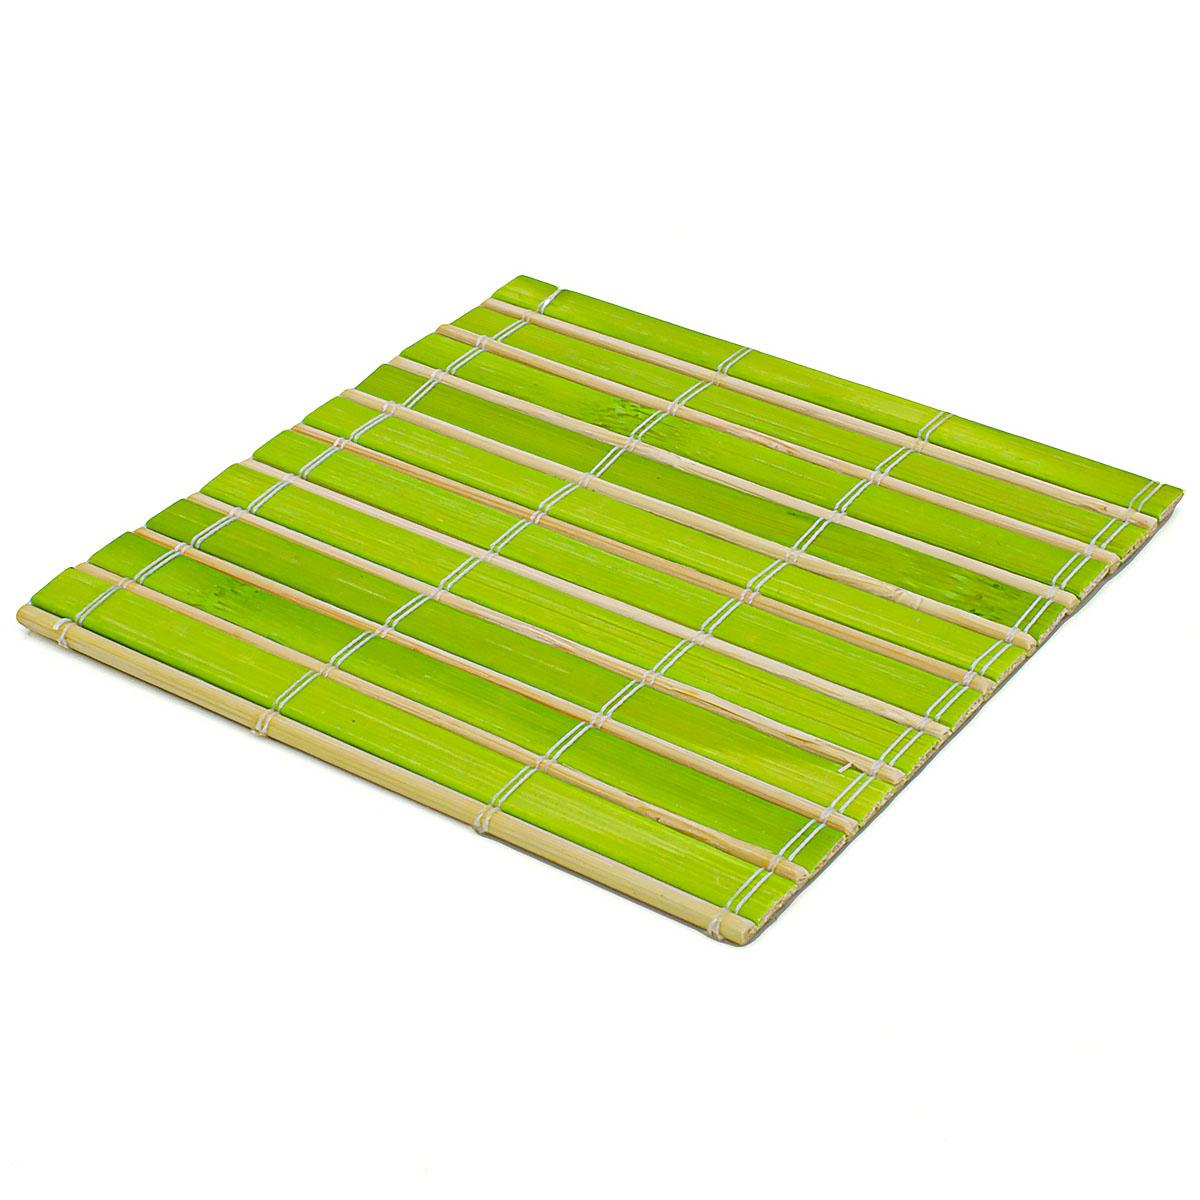 Набор чайных циновок (бамбук), ярко-зелёные, 10 х 10 см, 5 шт/упак набор чайных циновок бамбук красные двухцветные 10 х 10 см 5 шт упак